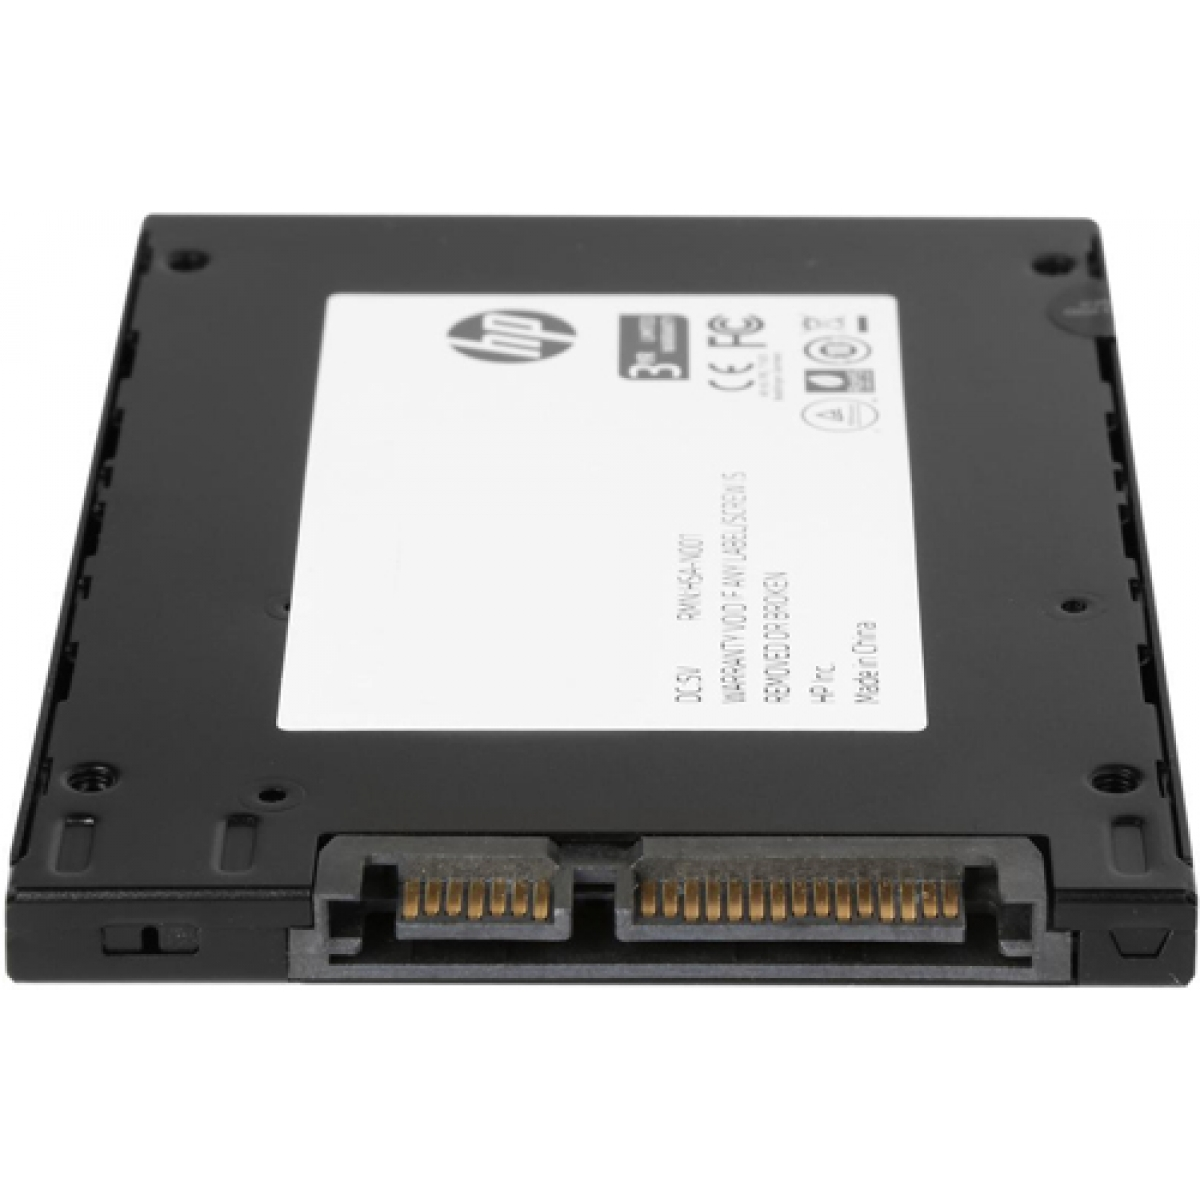 SSD HP S700 120GB, Sata III, Leitura 550MBs Gravação 480MBs, 2DP97AA#ABL